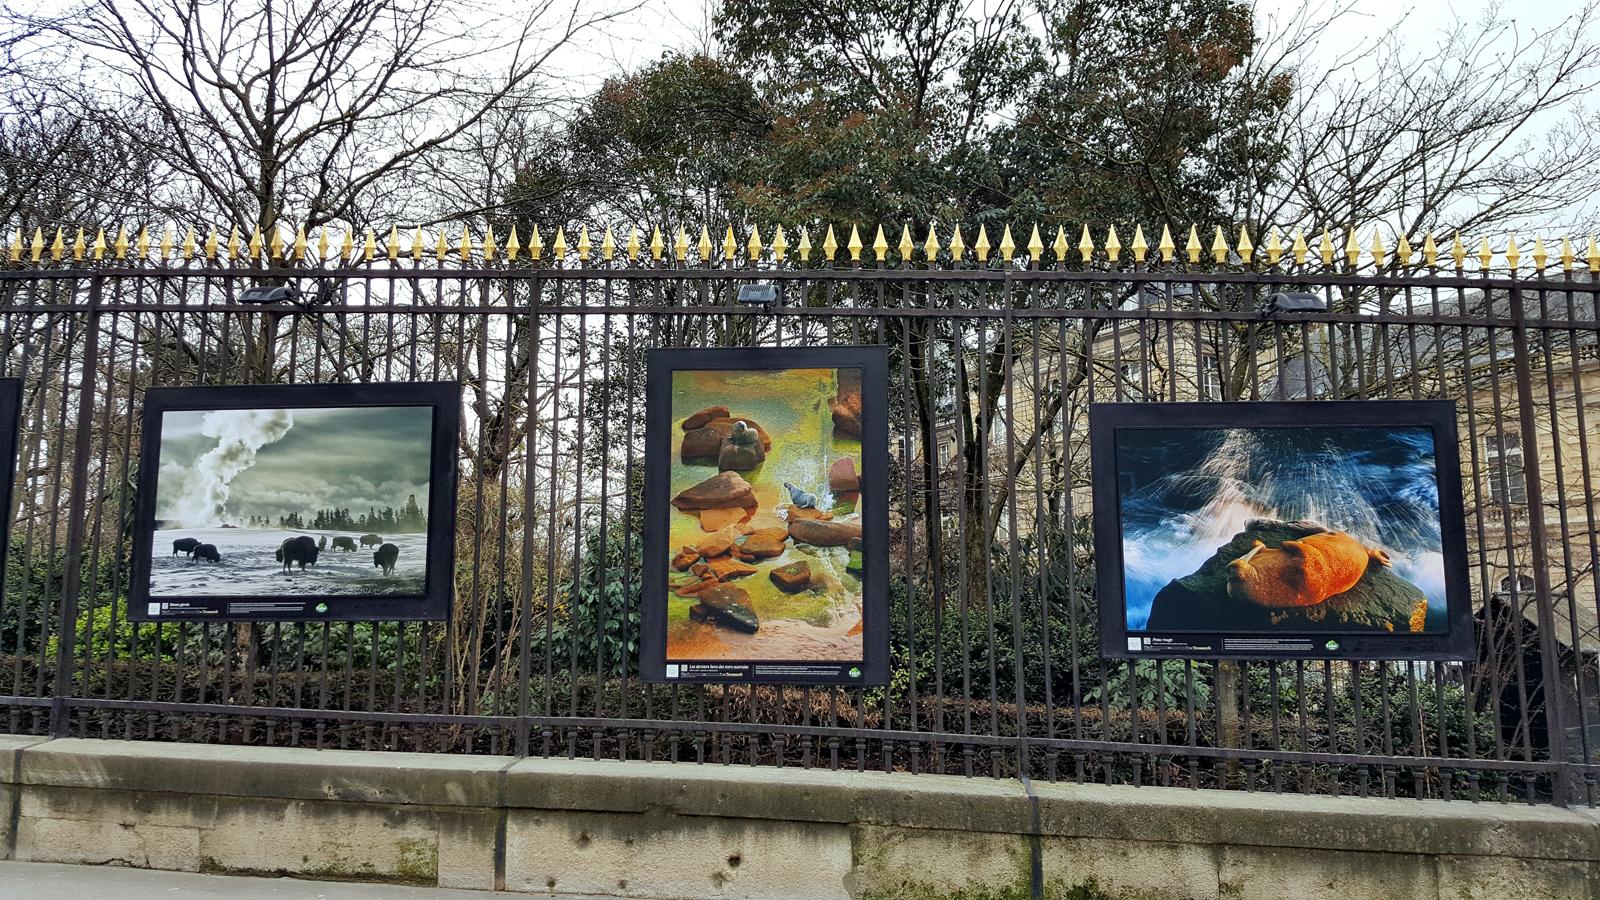 Origines jardin du luxembourg la force naturelle de la - Exposition jardin du luxembourg ...